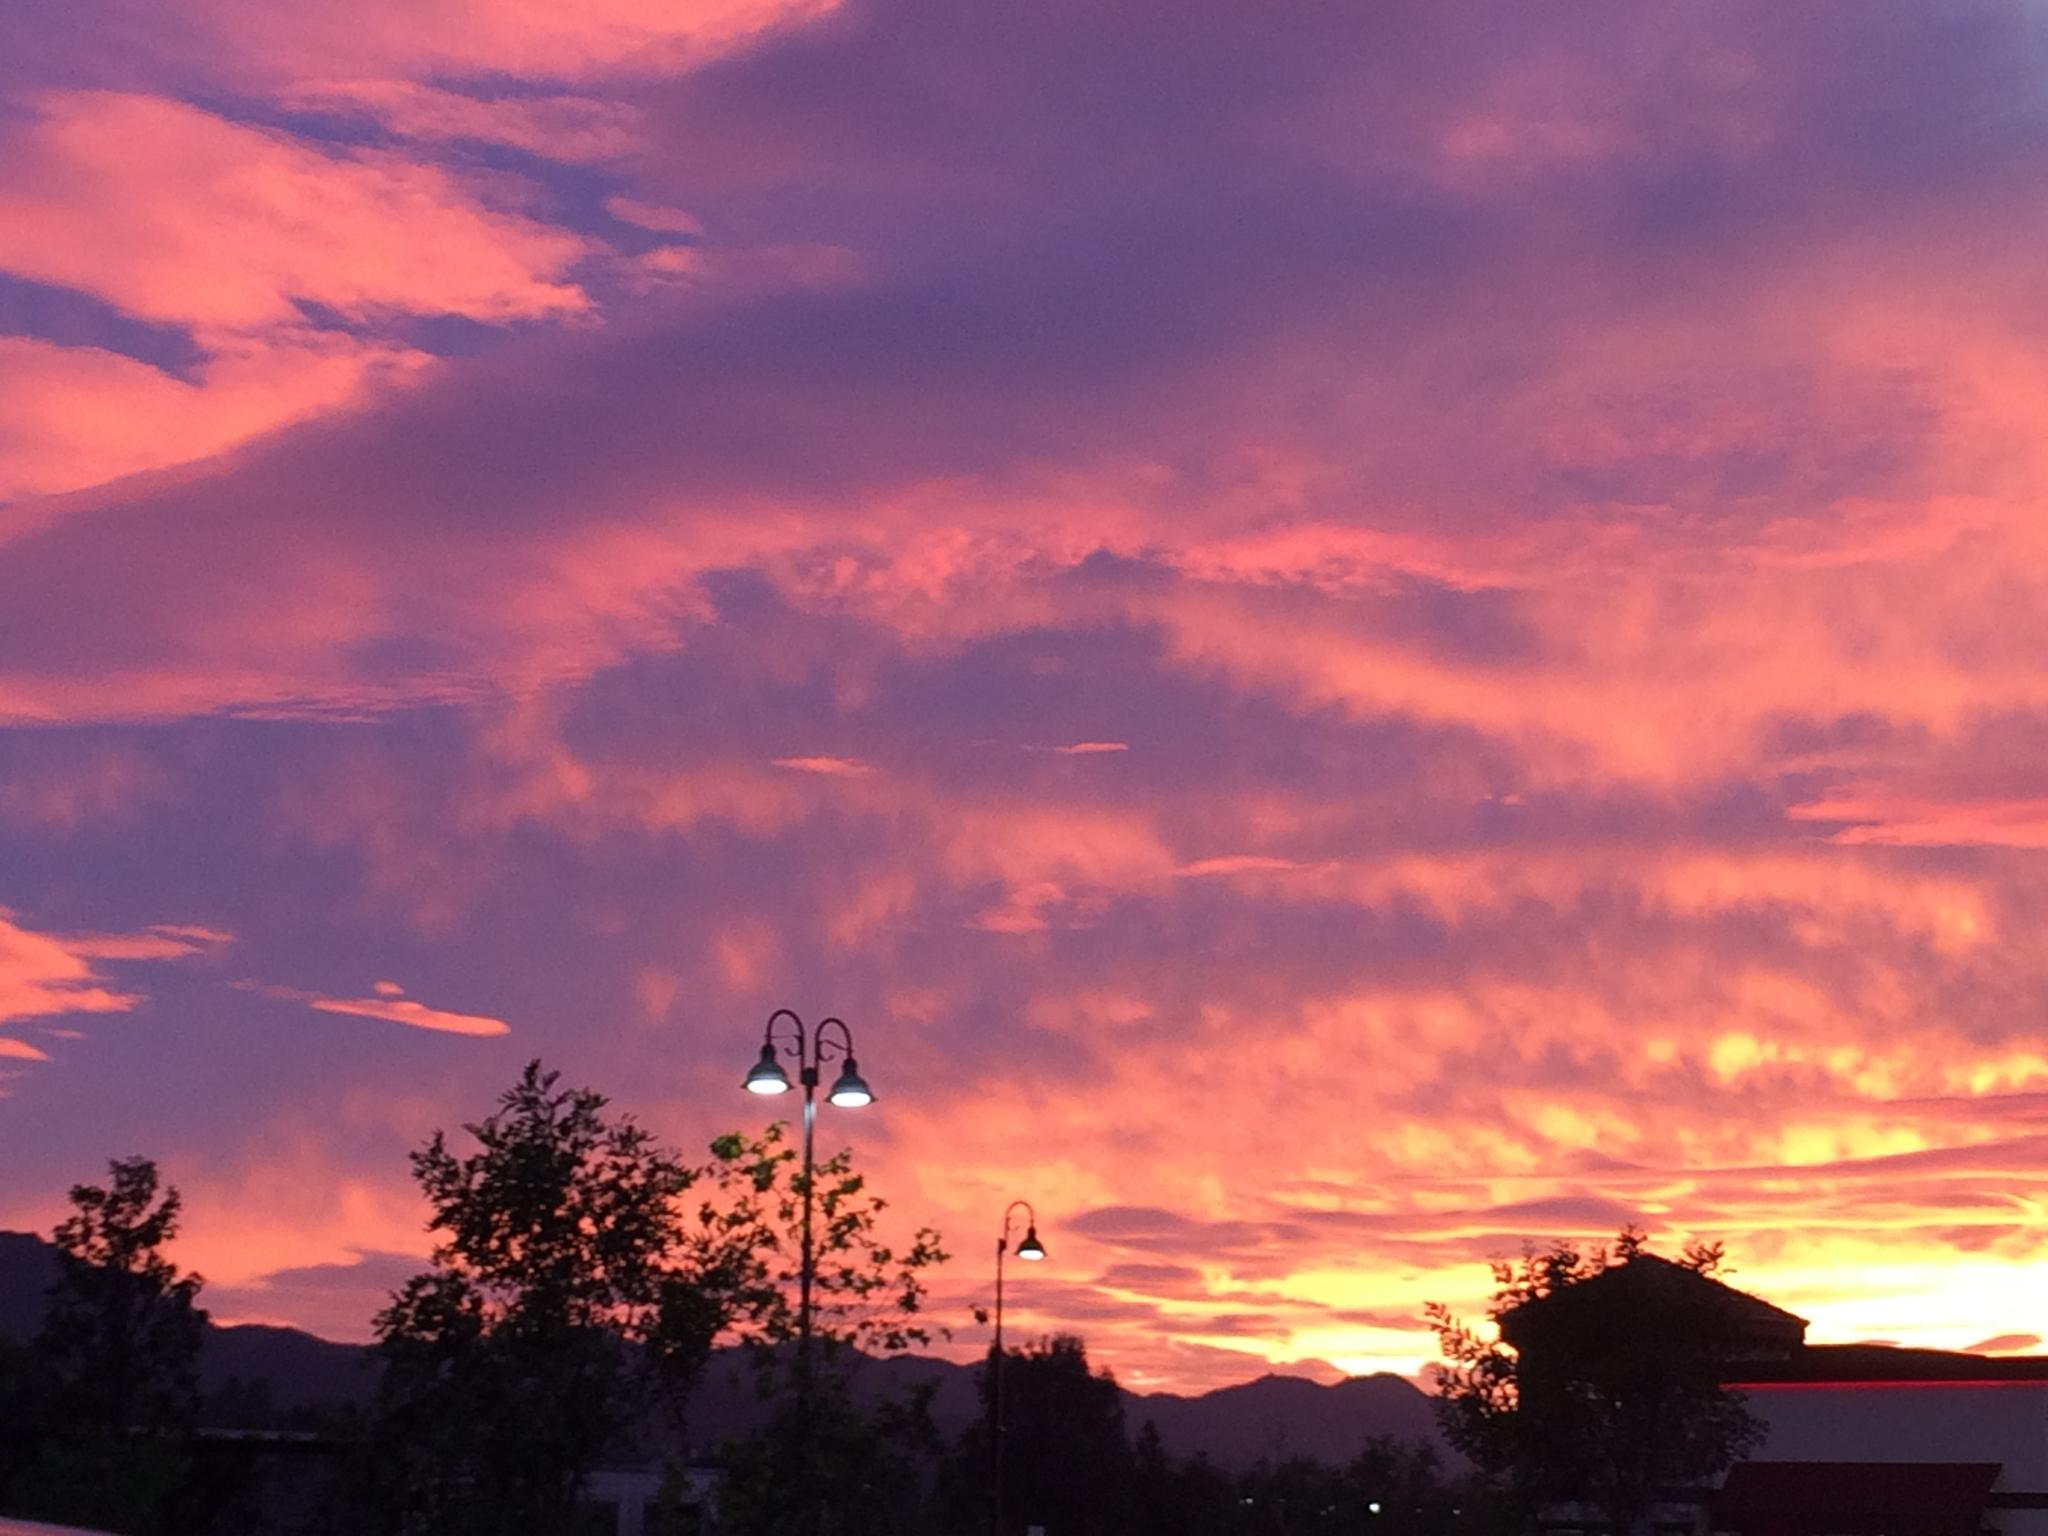 sunset by Anoosh